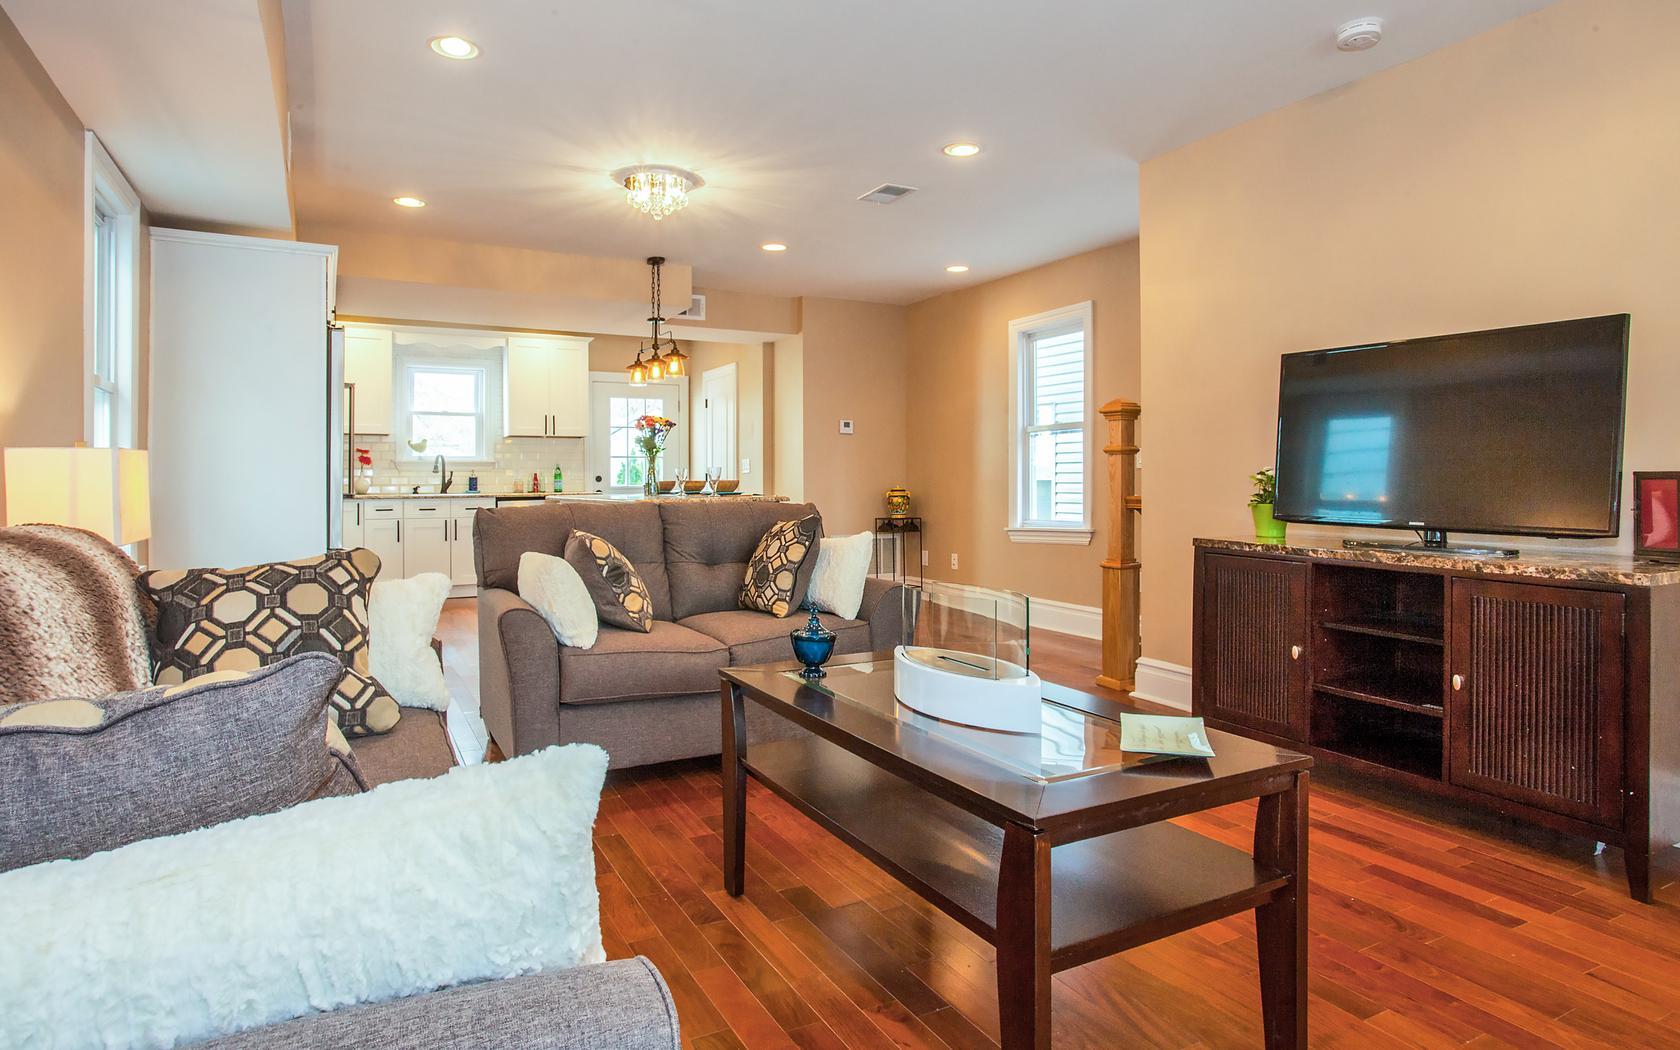 独户住宅 为 销售 在 Gorgeous newly renovated Three bedroom, Three and a half bath!! 31 West 41st Street Bayonne, 新泽西州 07002 美国